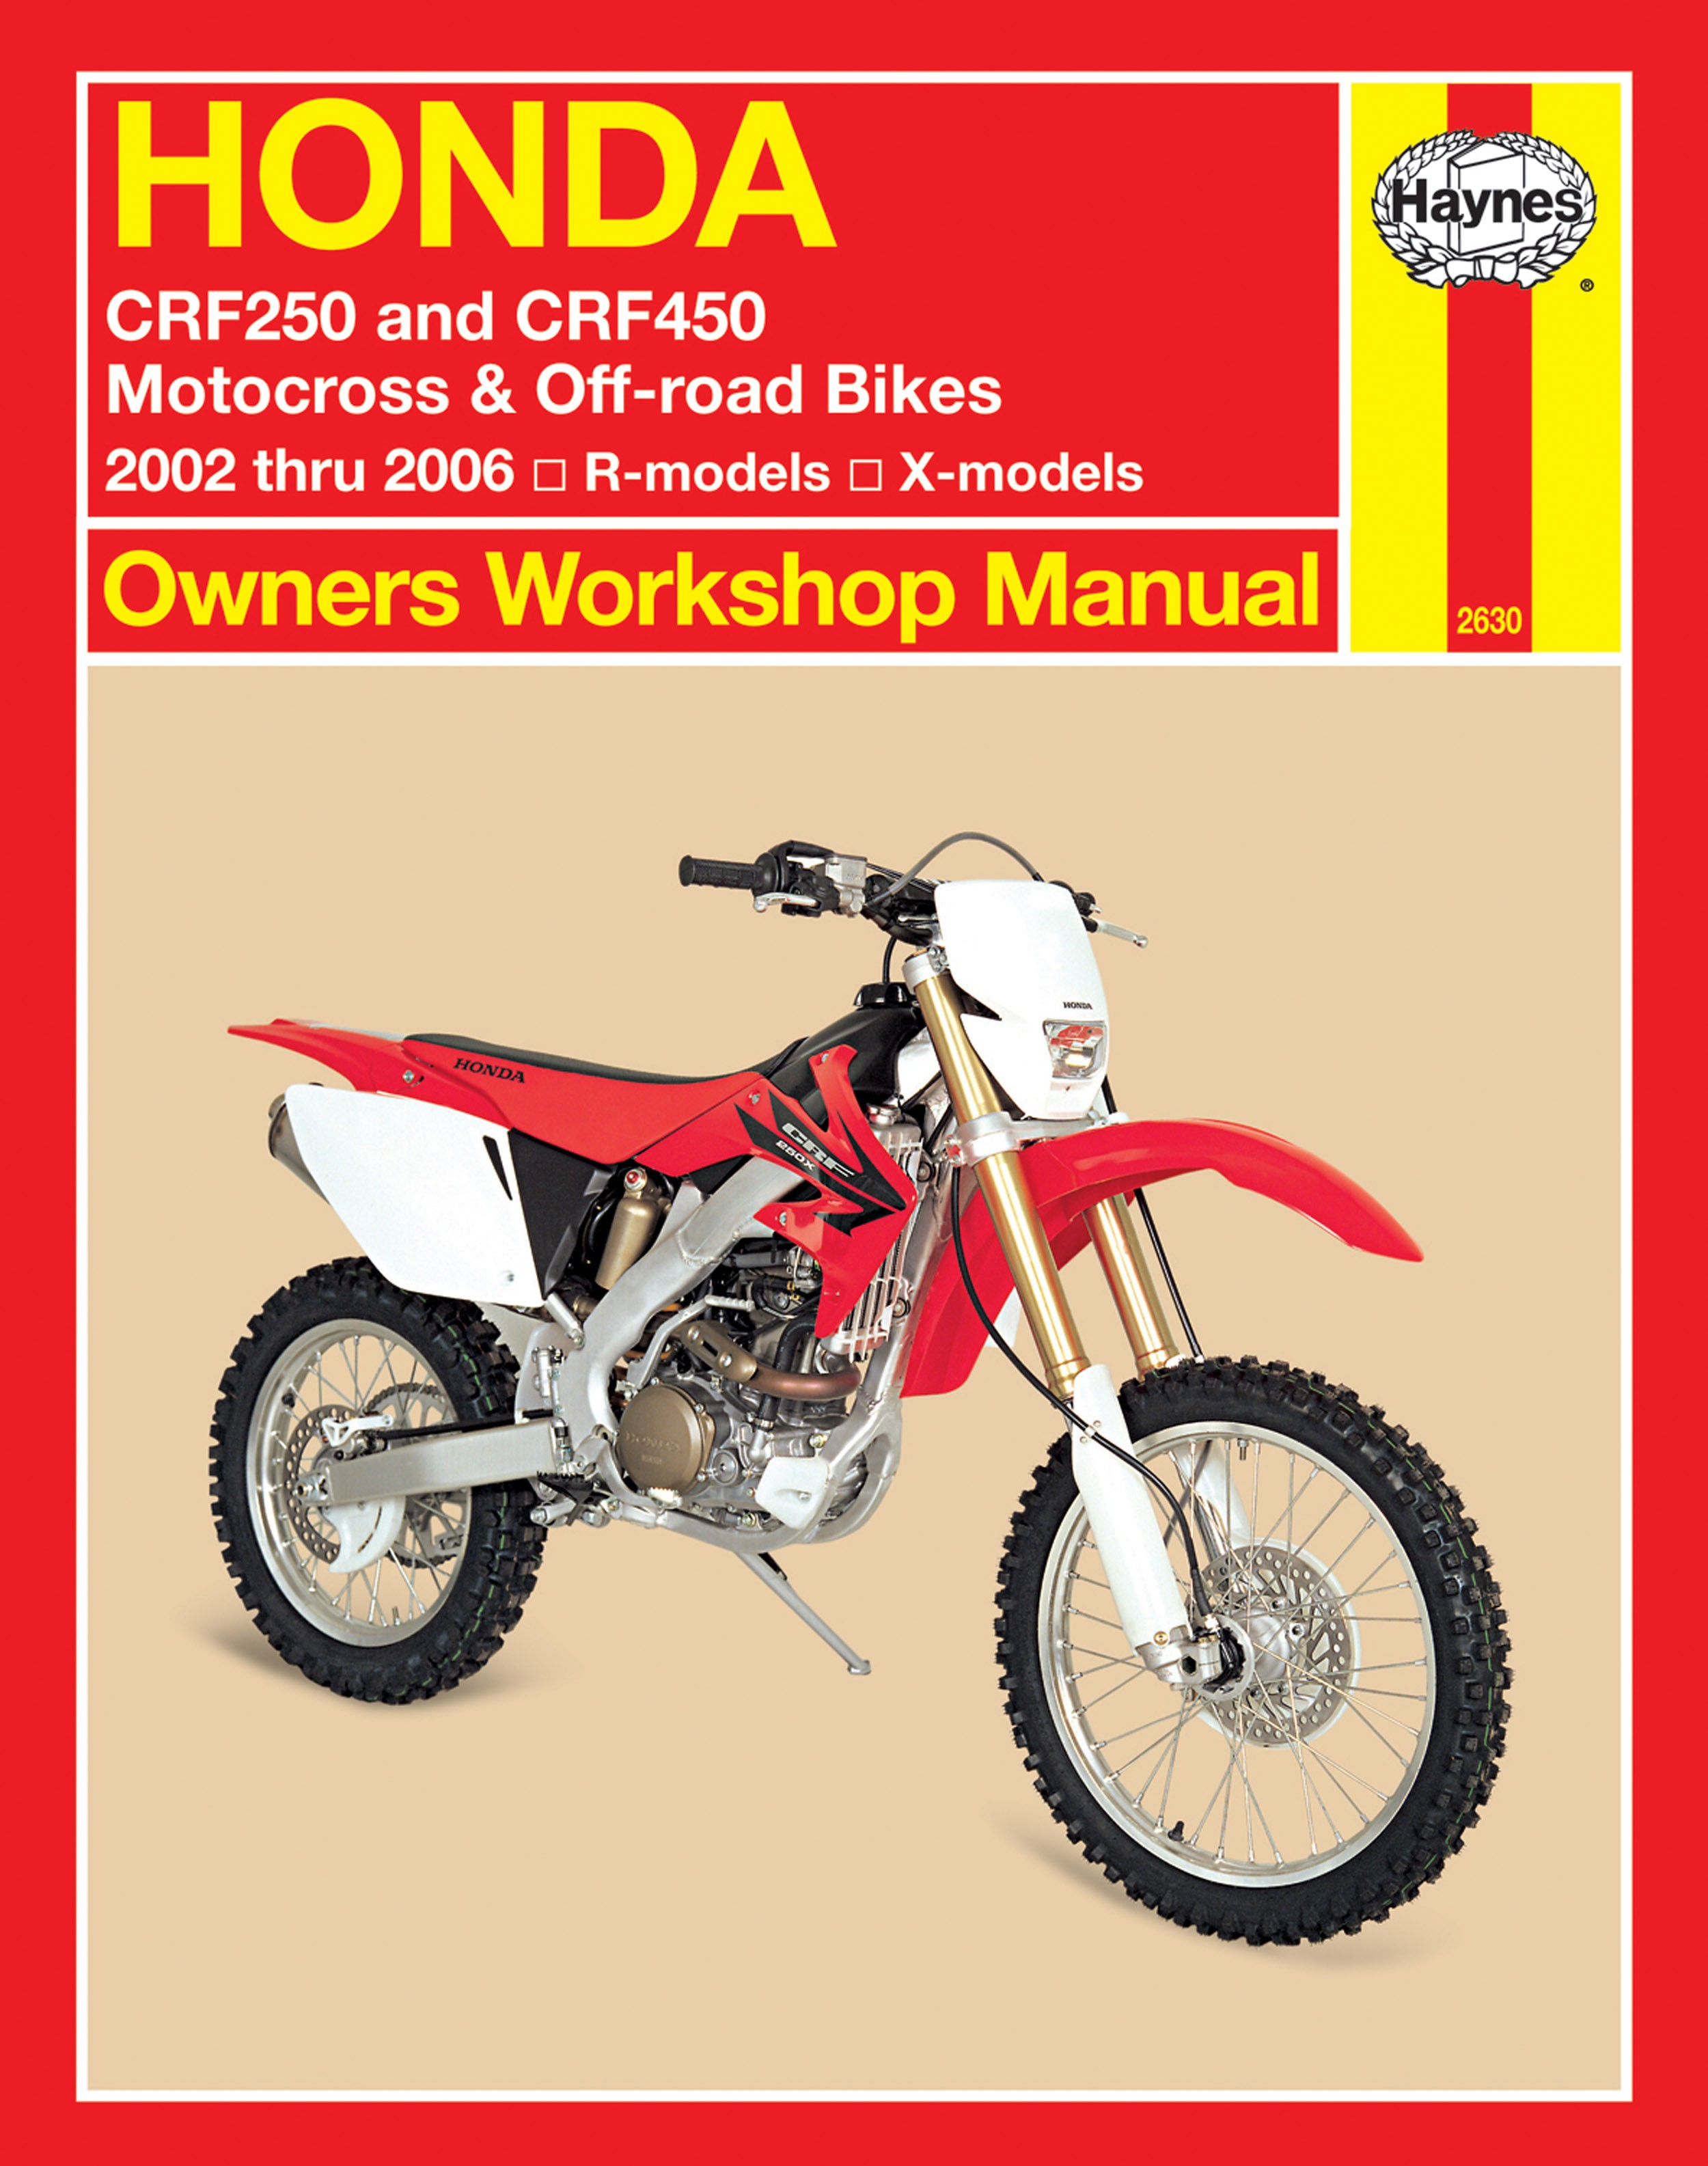 HAYNES Repair Manual - Honda CRF250R/CRF250X (2004-2006) CRF450R (2002-2006)  CRF450X (2005-2006)